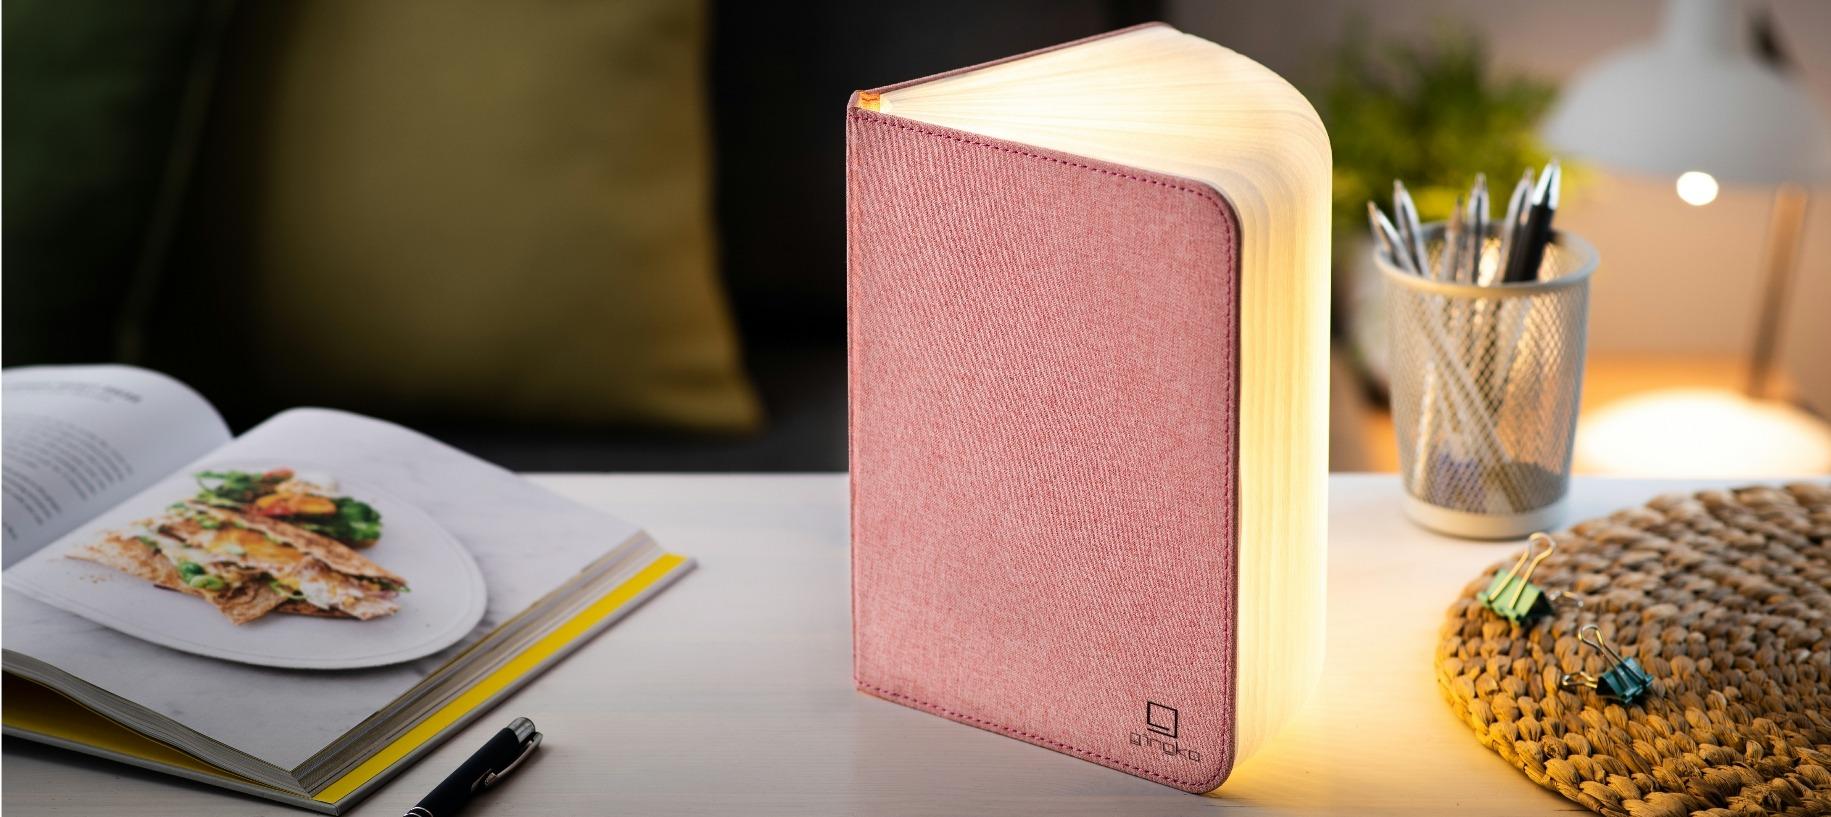 LED Smart Book Light Blush Pink